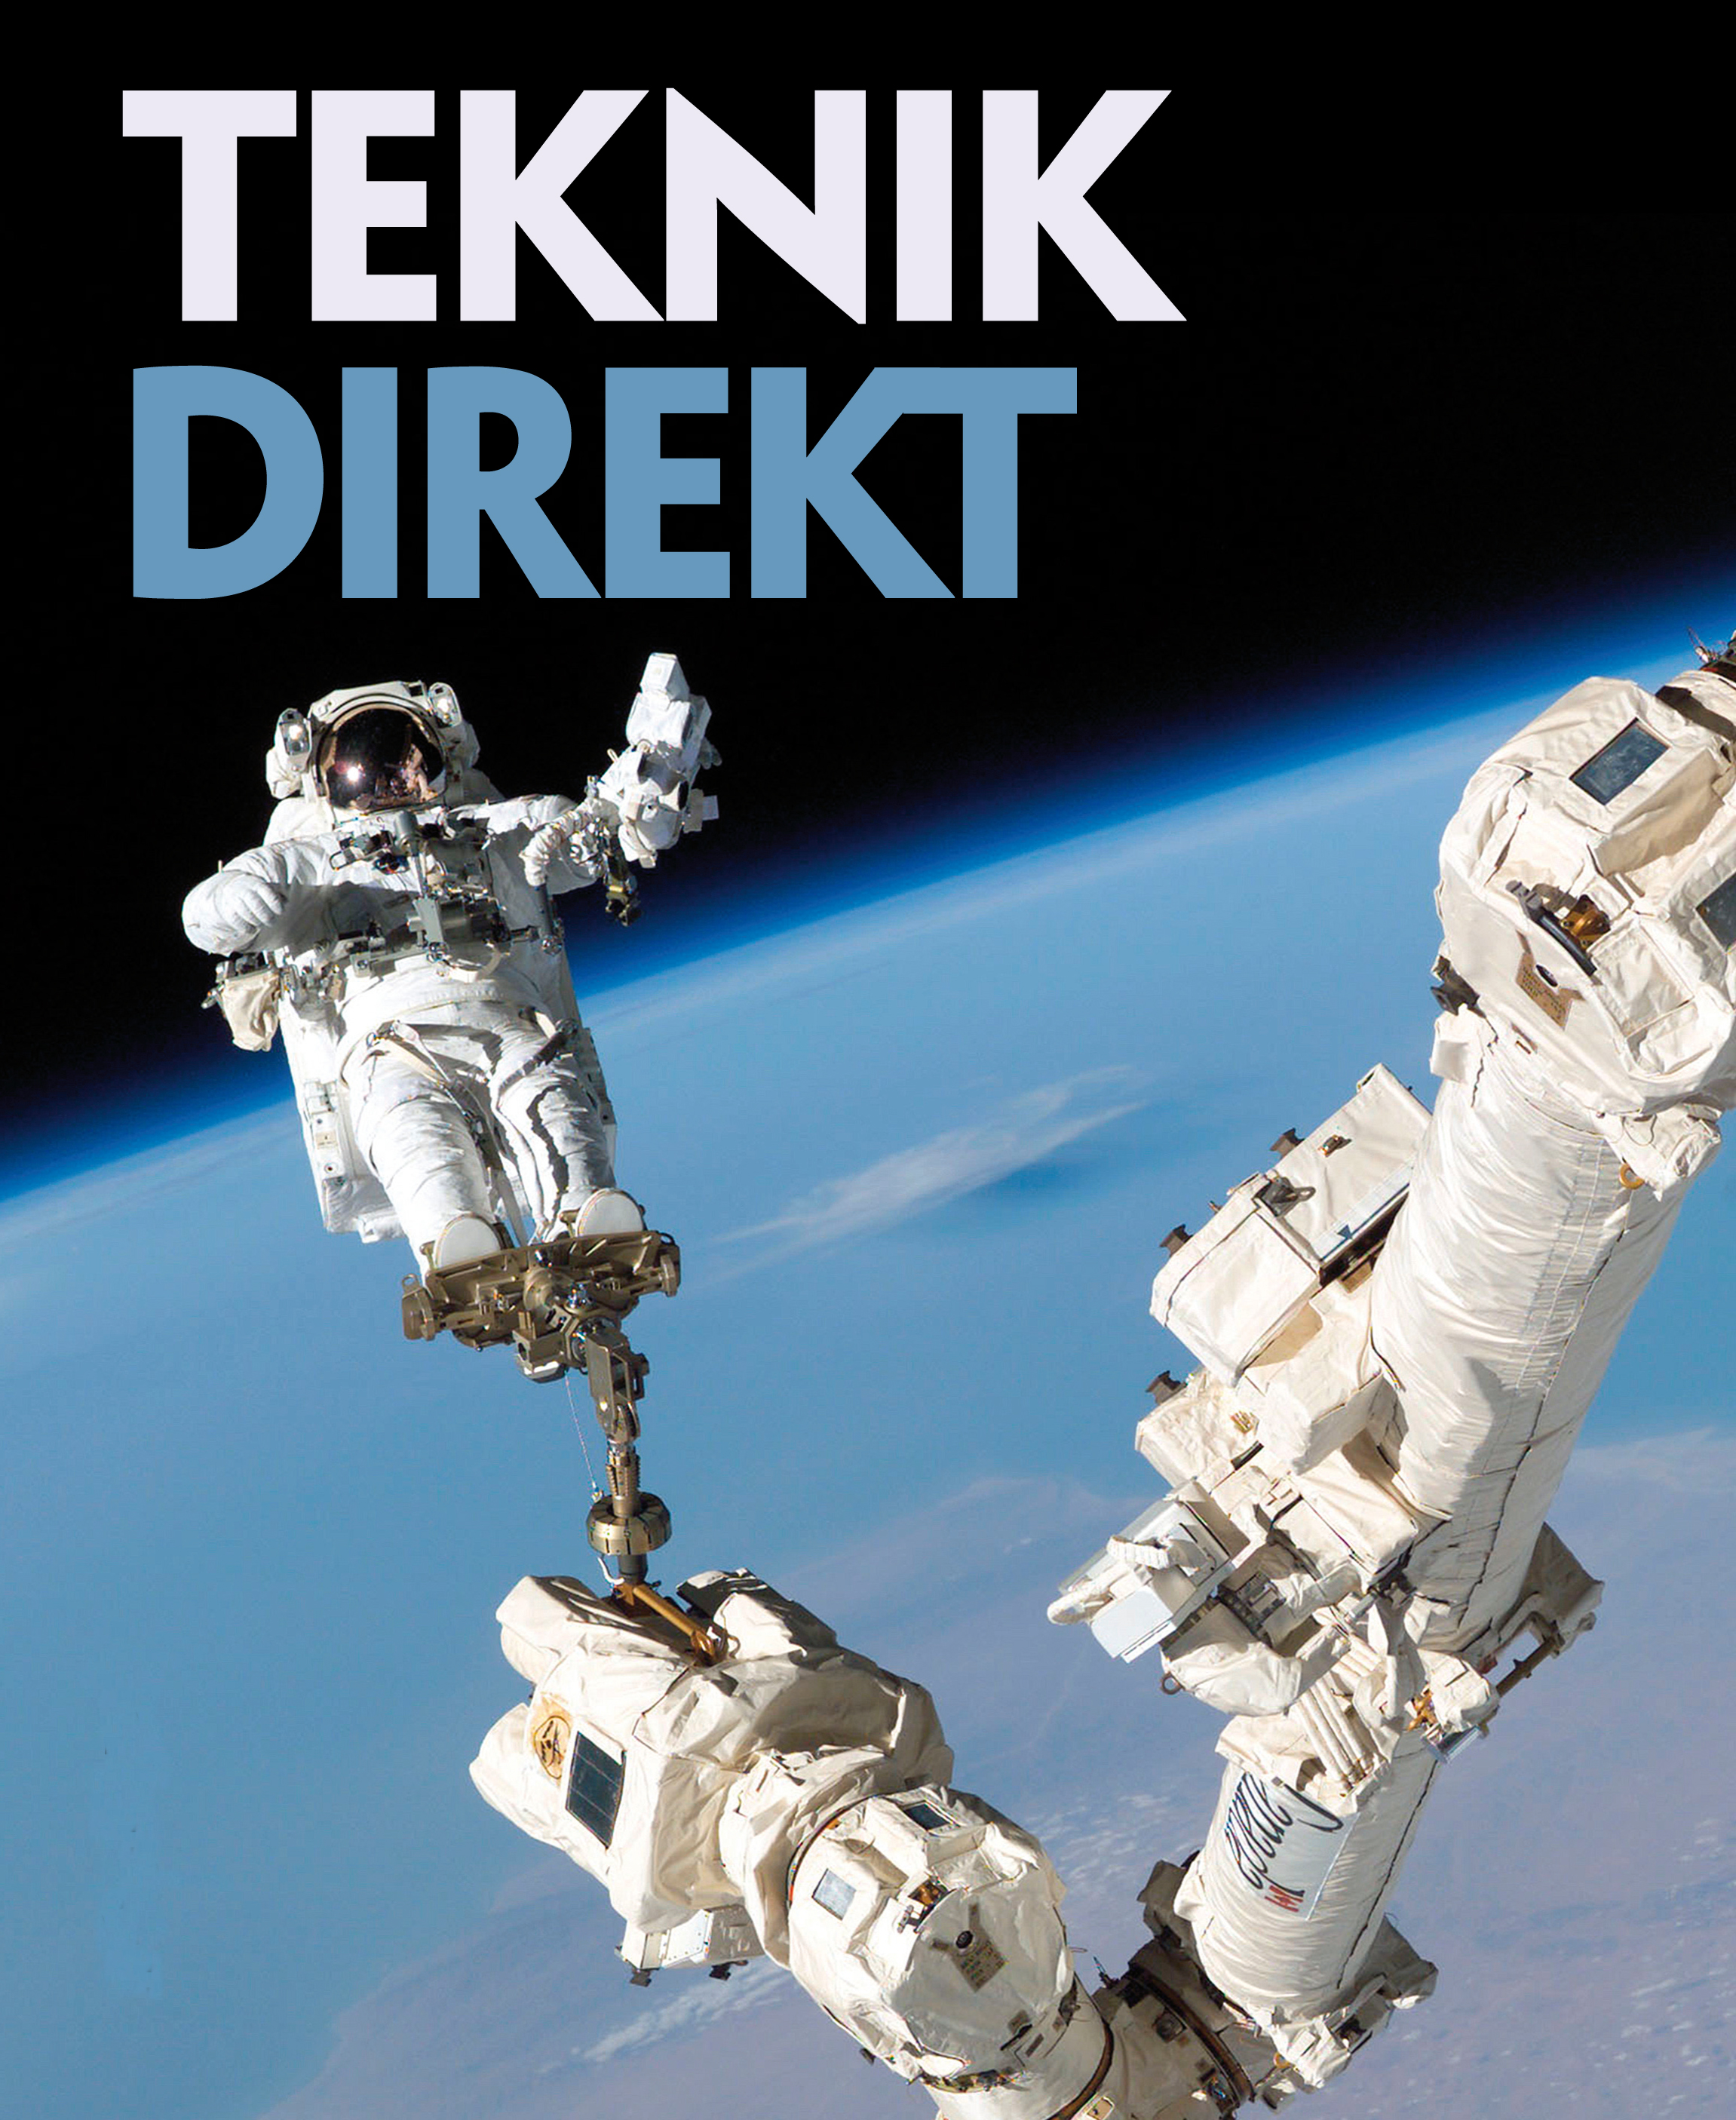 Astronaut på rymdpromenad.